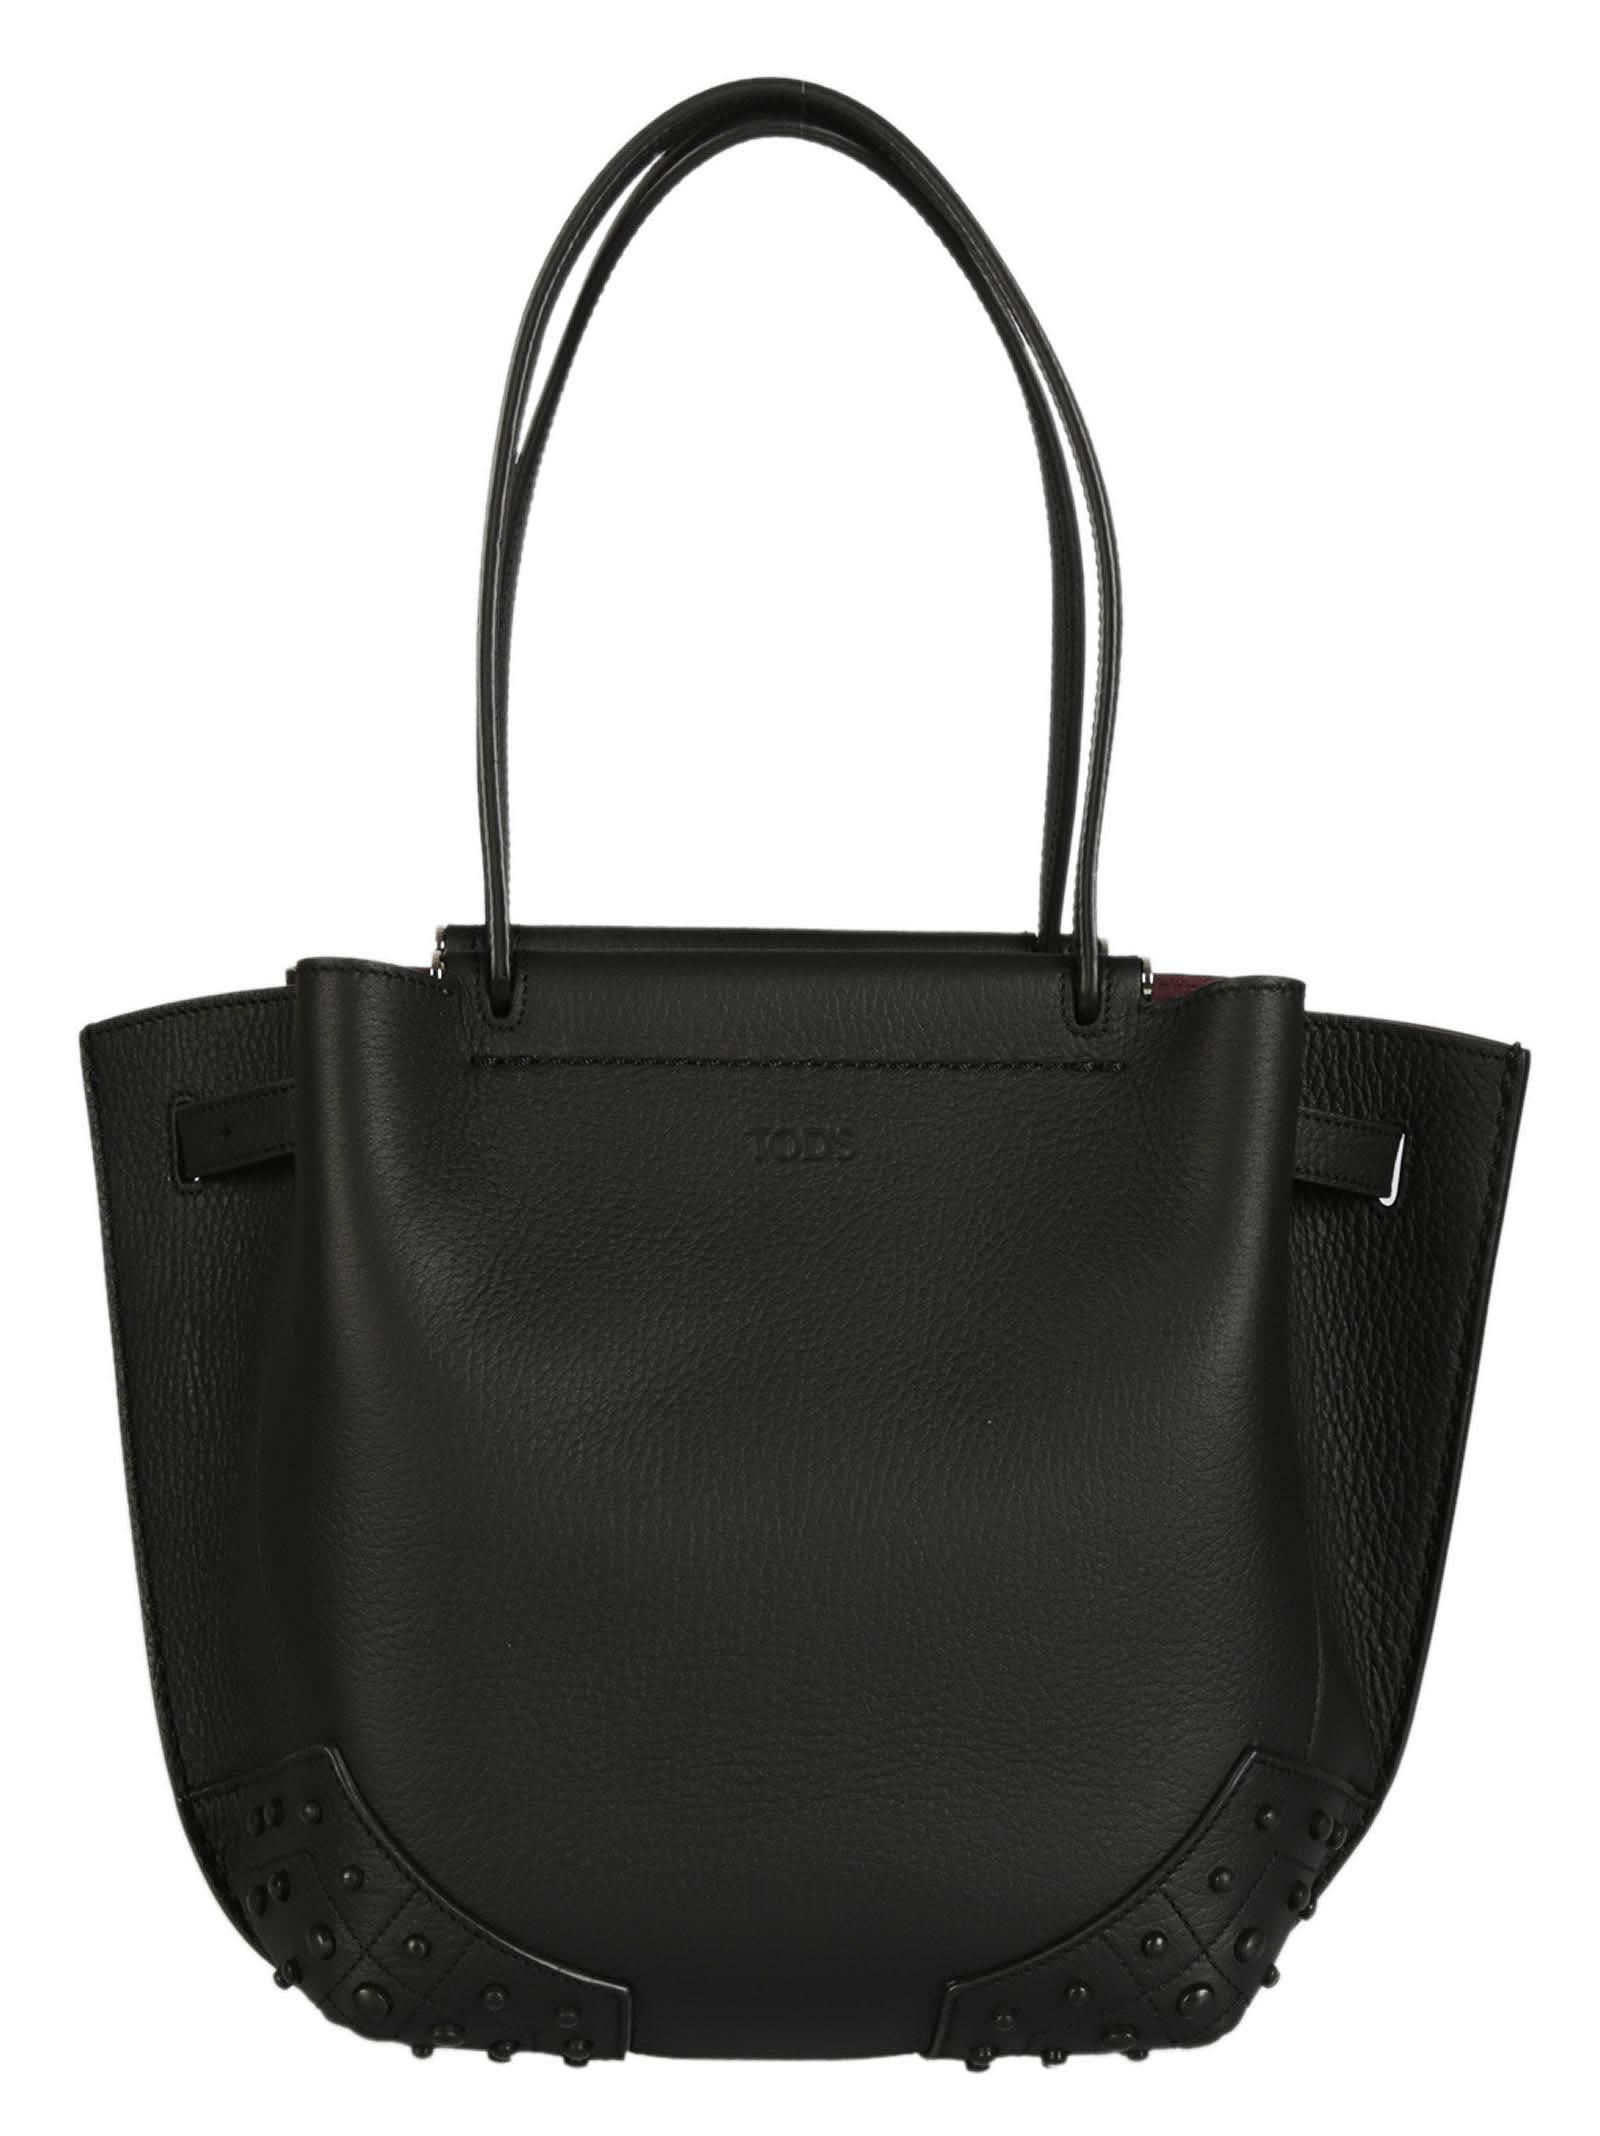 Tods Studded Shopper Bag